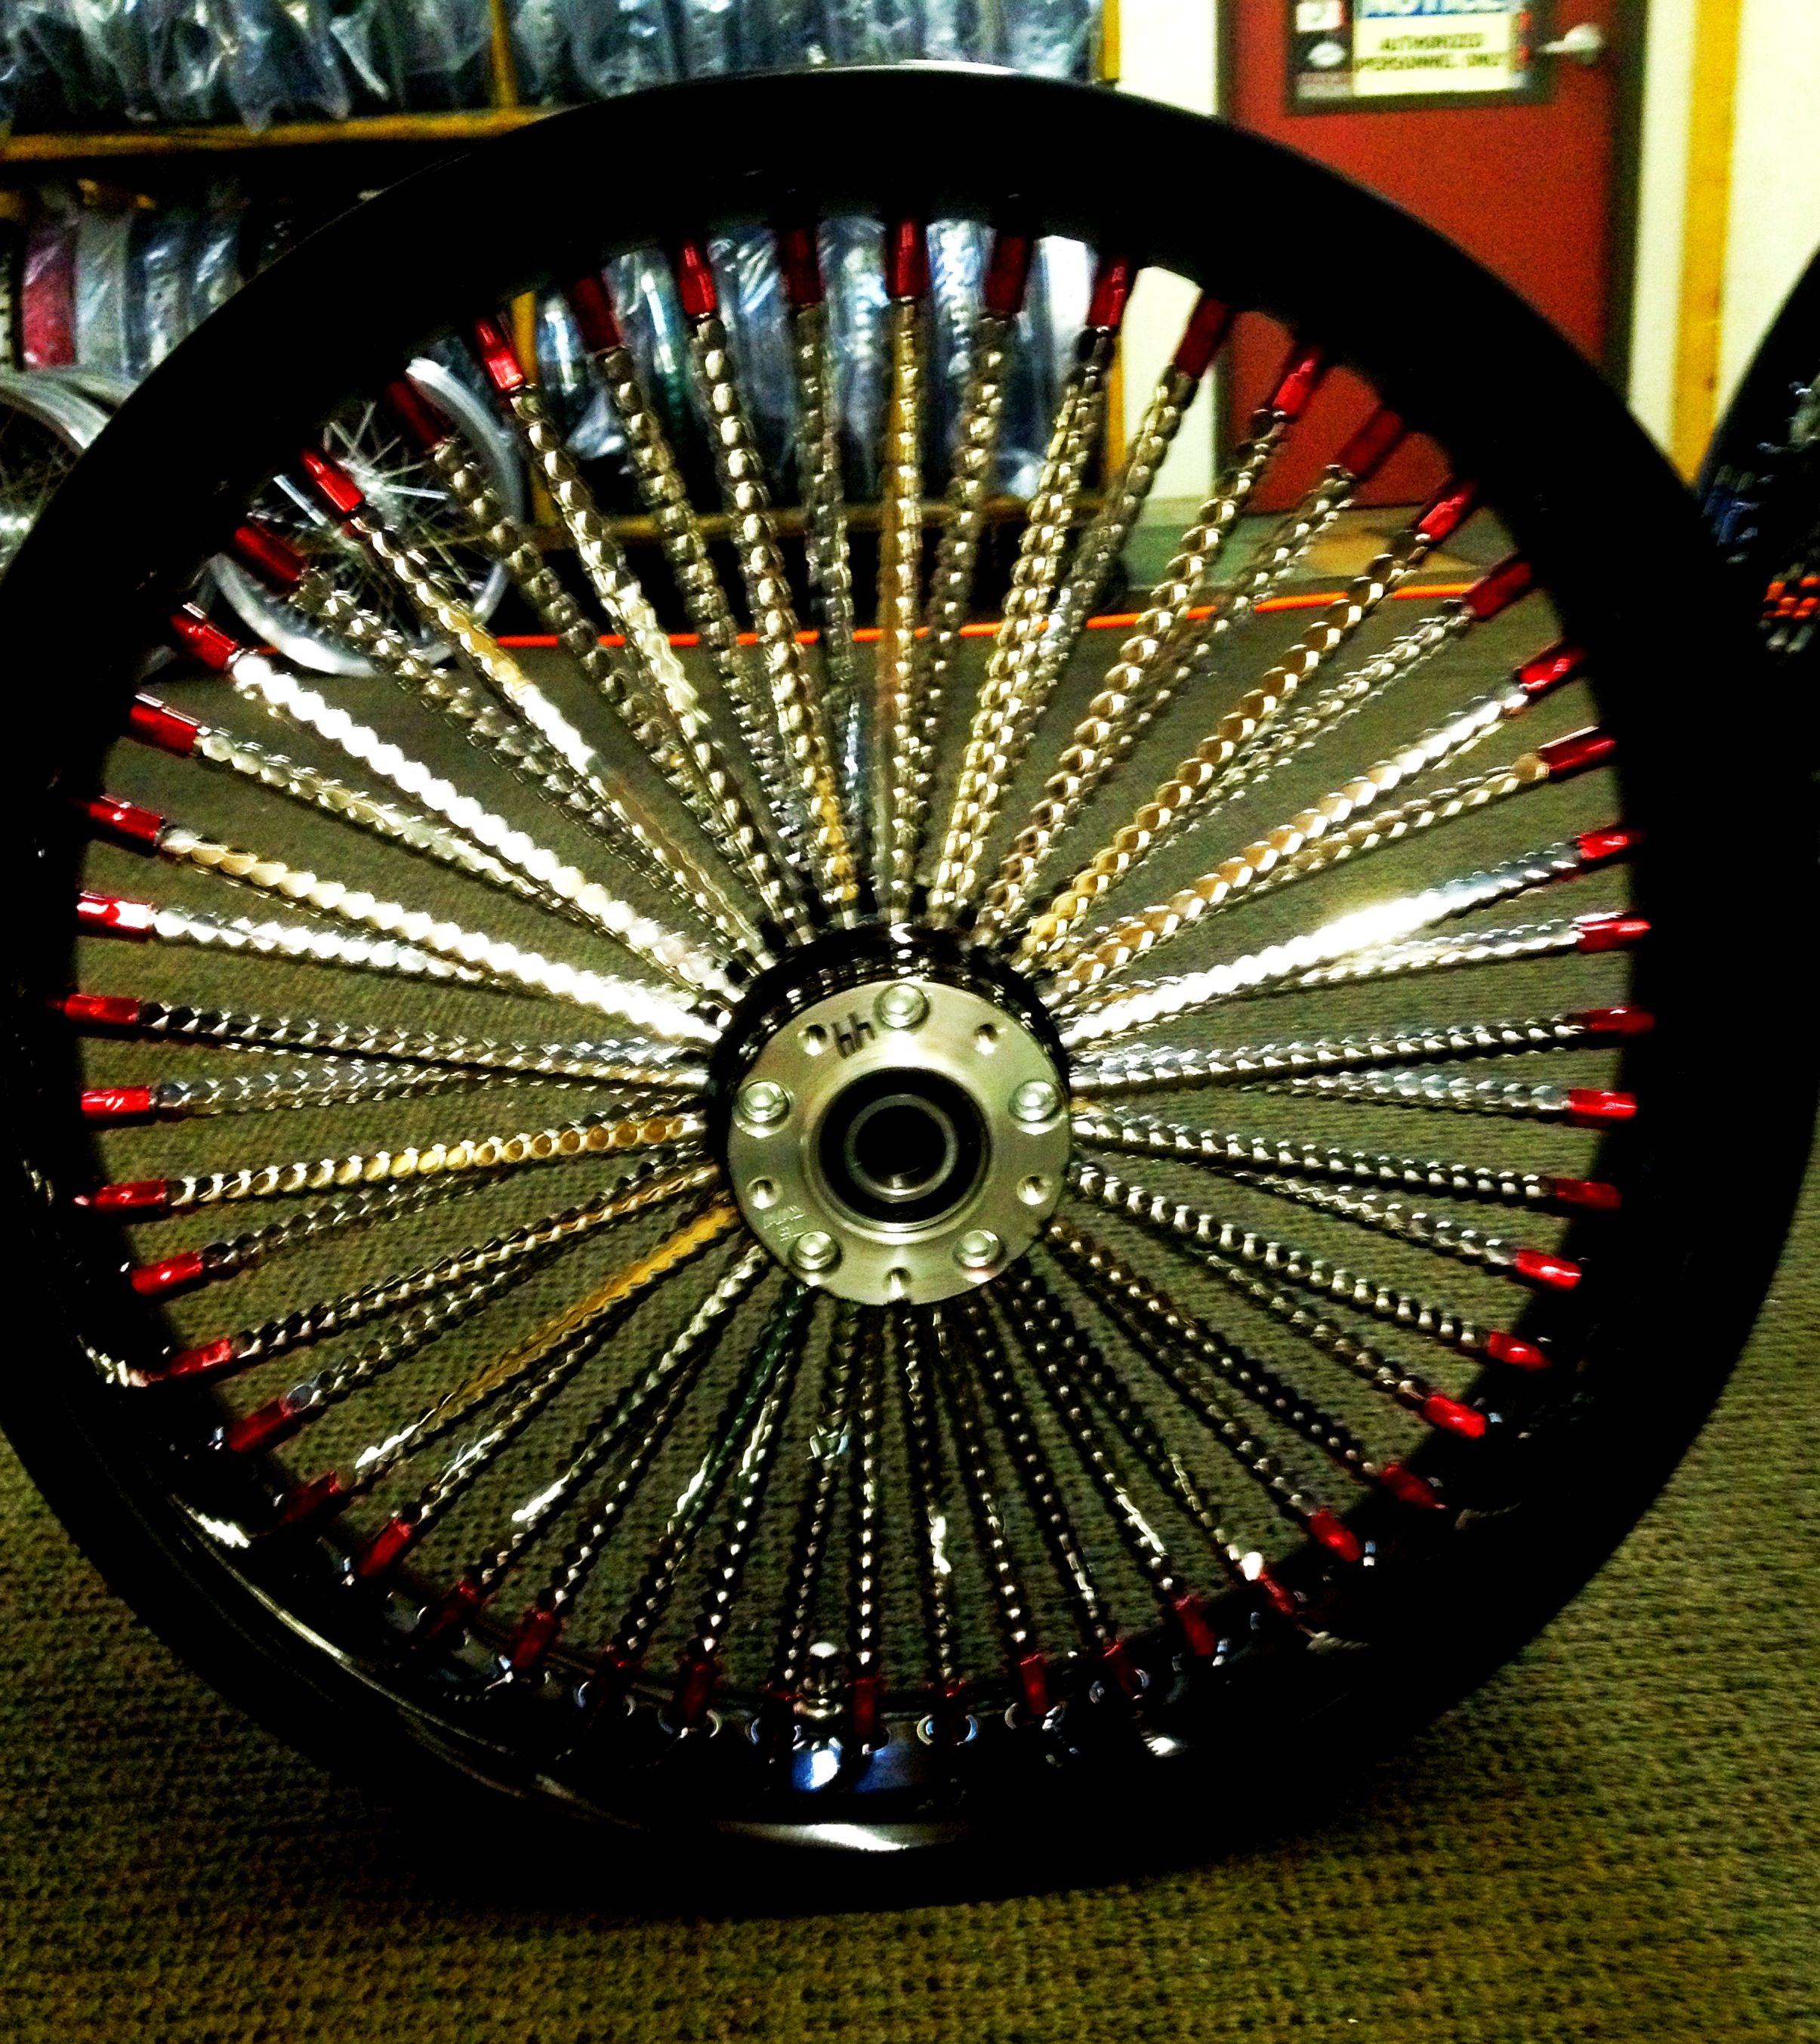 Pin on Harleys, customized